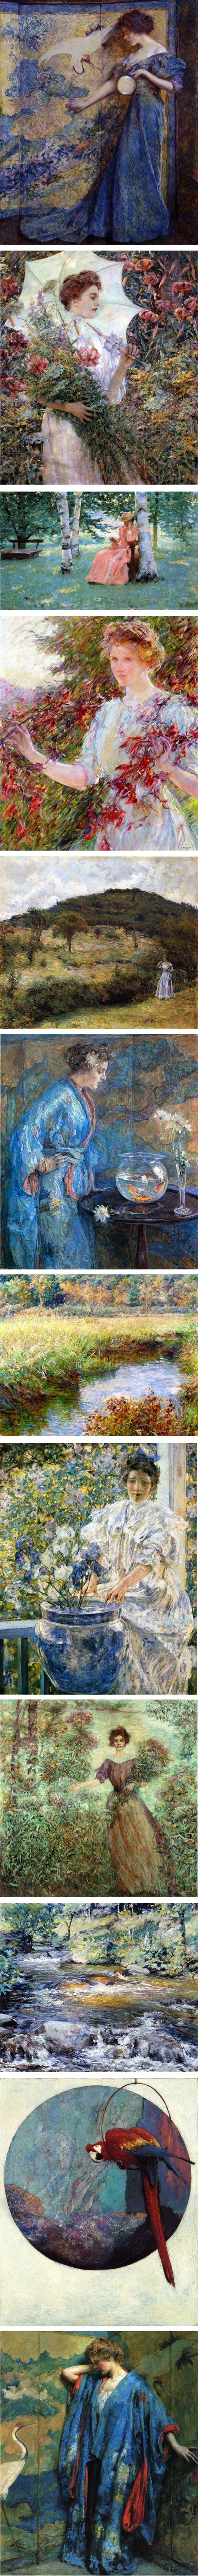 Robert Lewis Reid, American Impressionist and member of the Ten American Painters